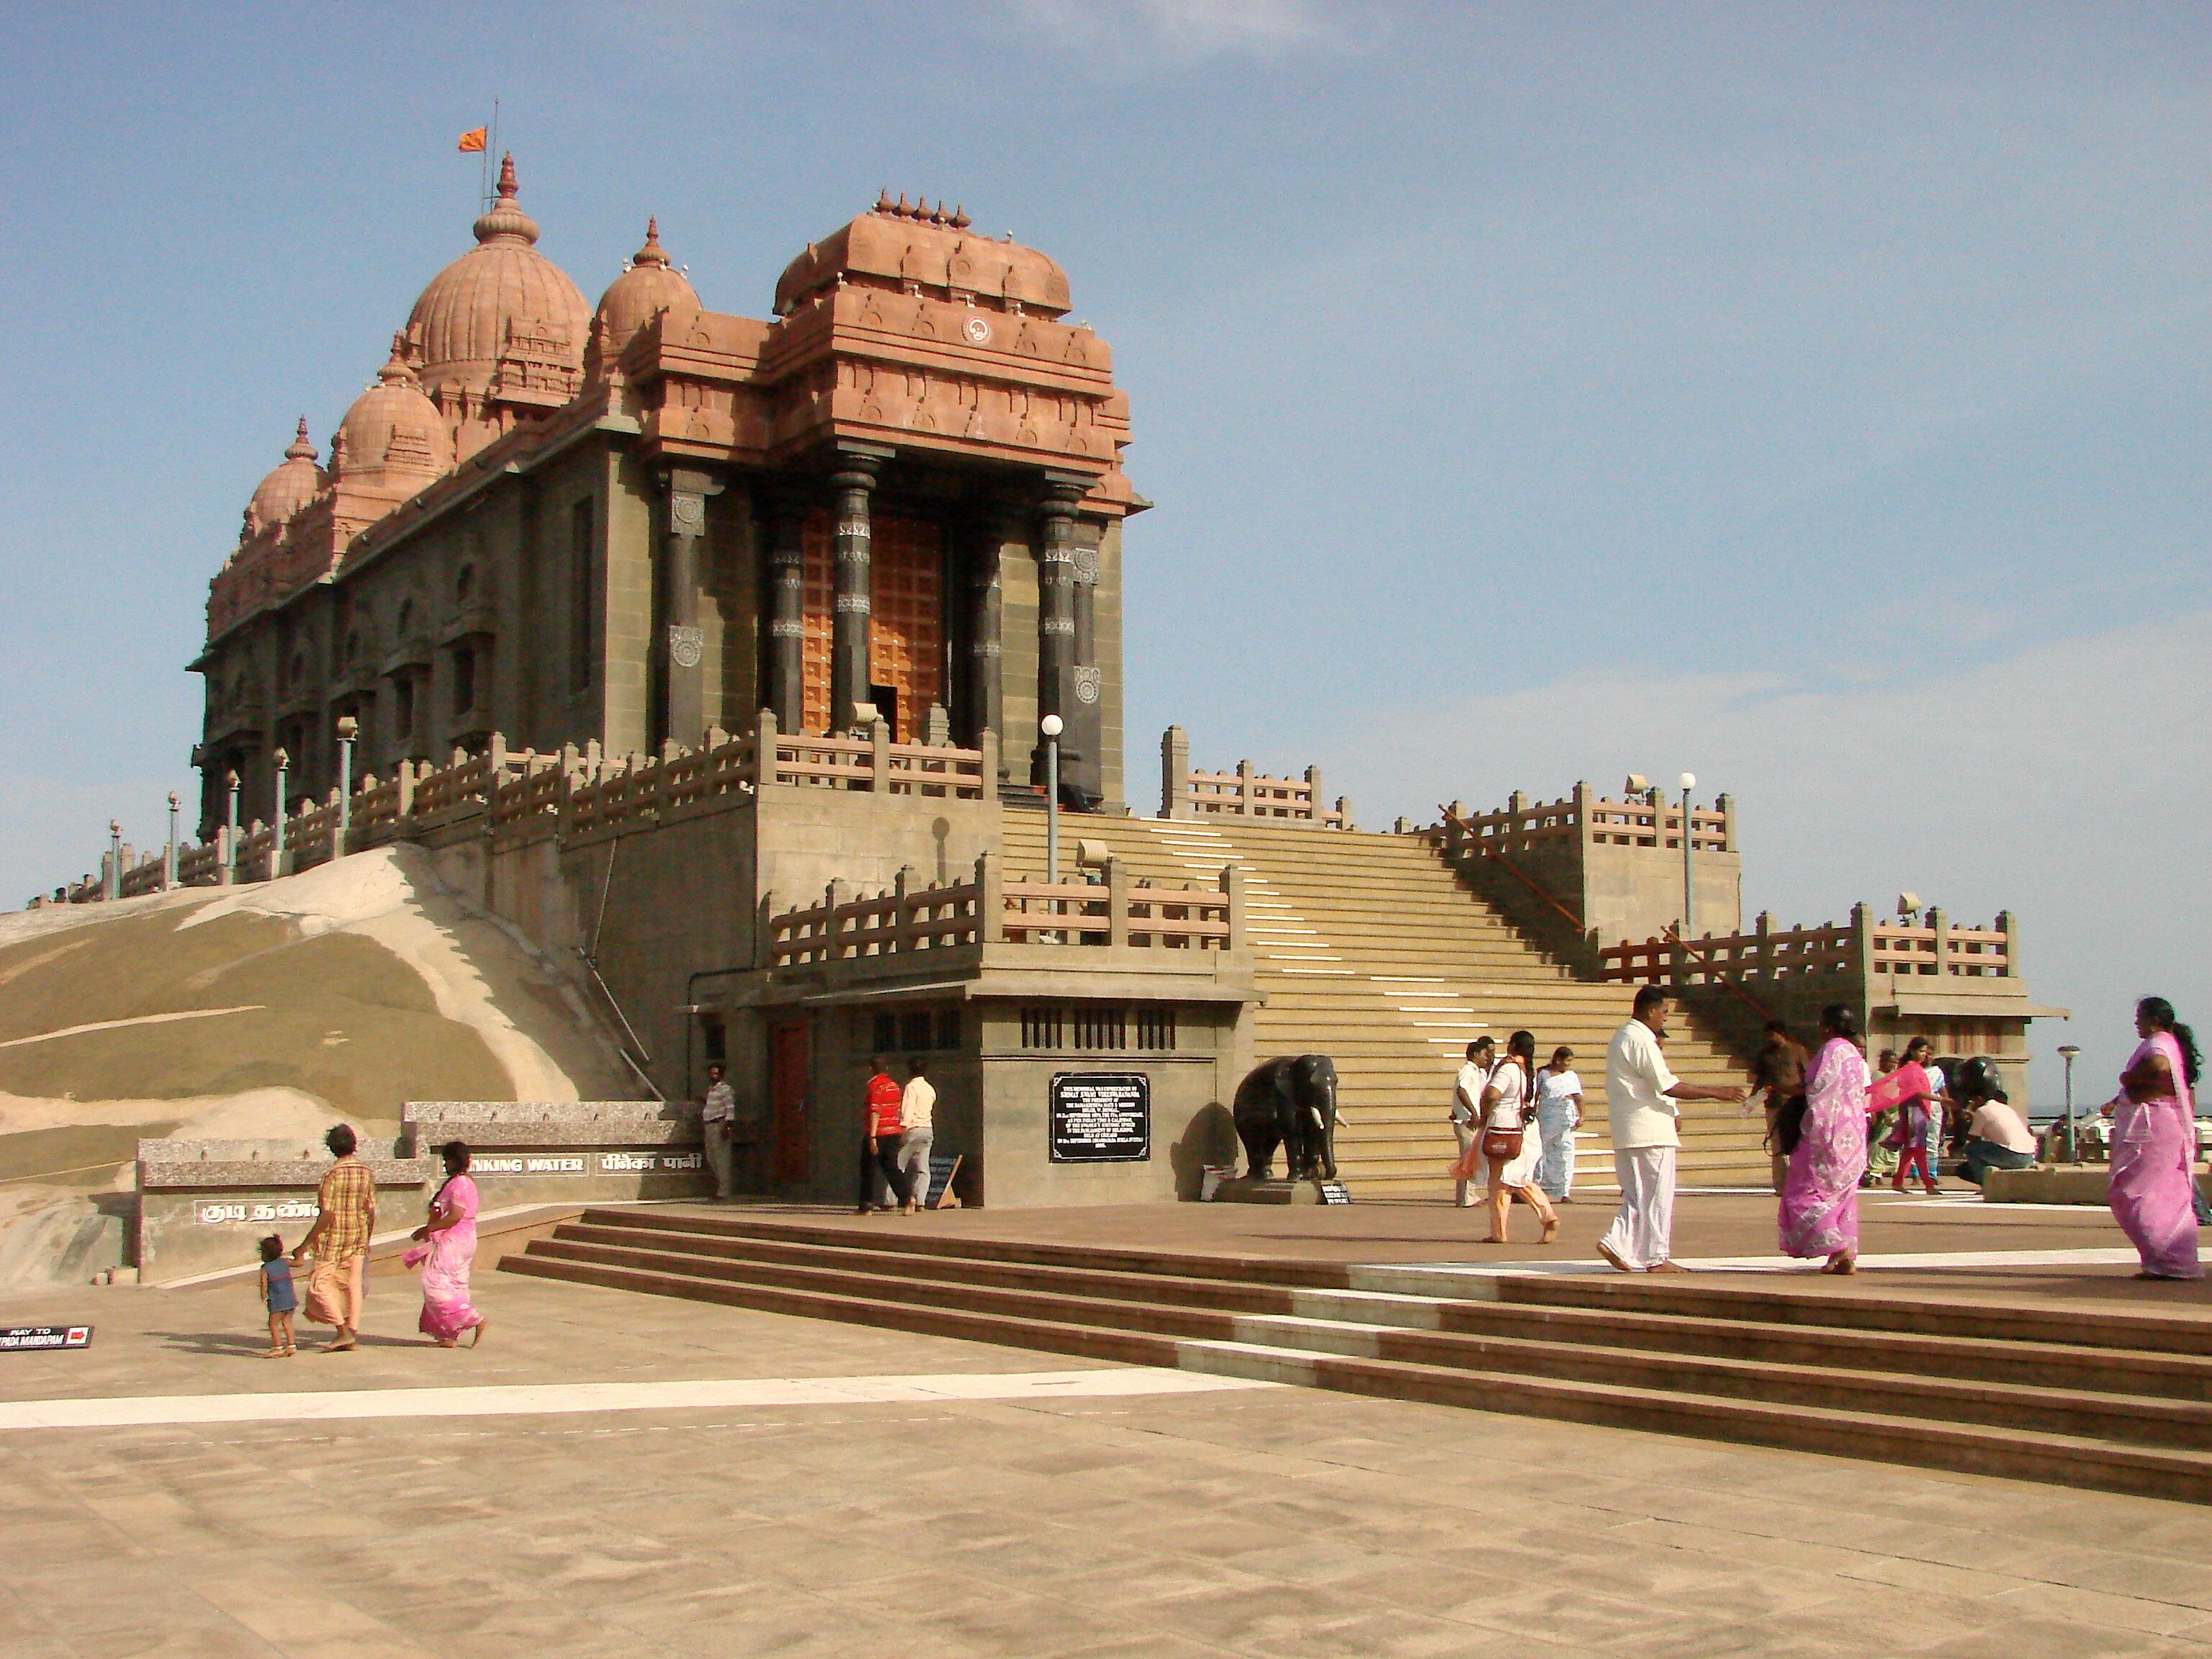 Vivekananda Temple on Vivekananda rock at Kanyakumari, India